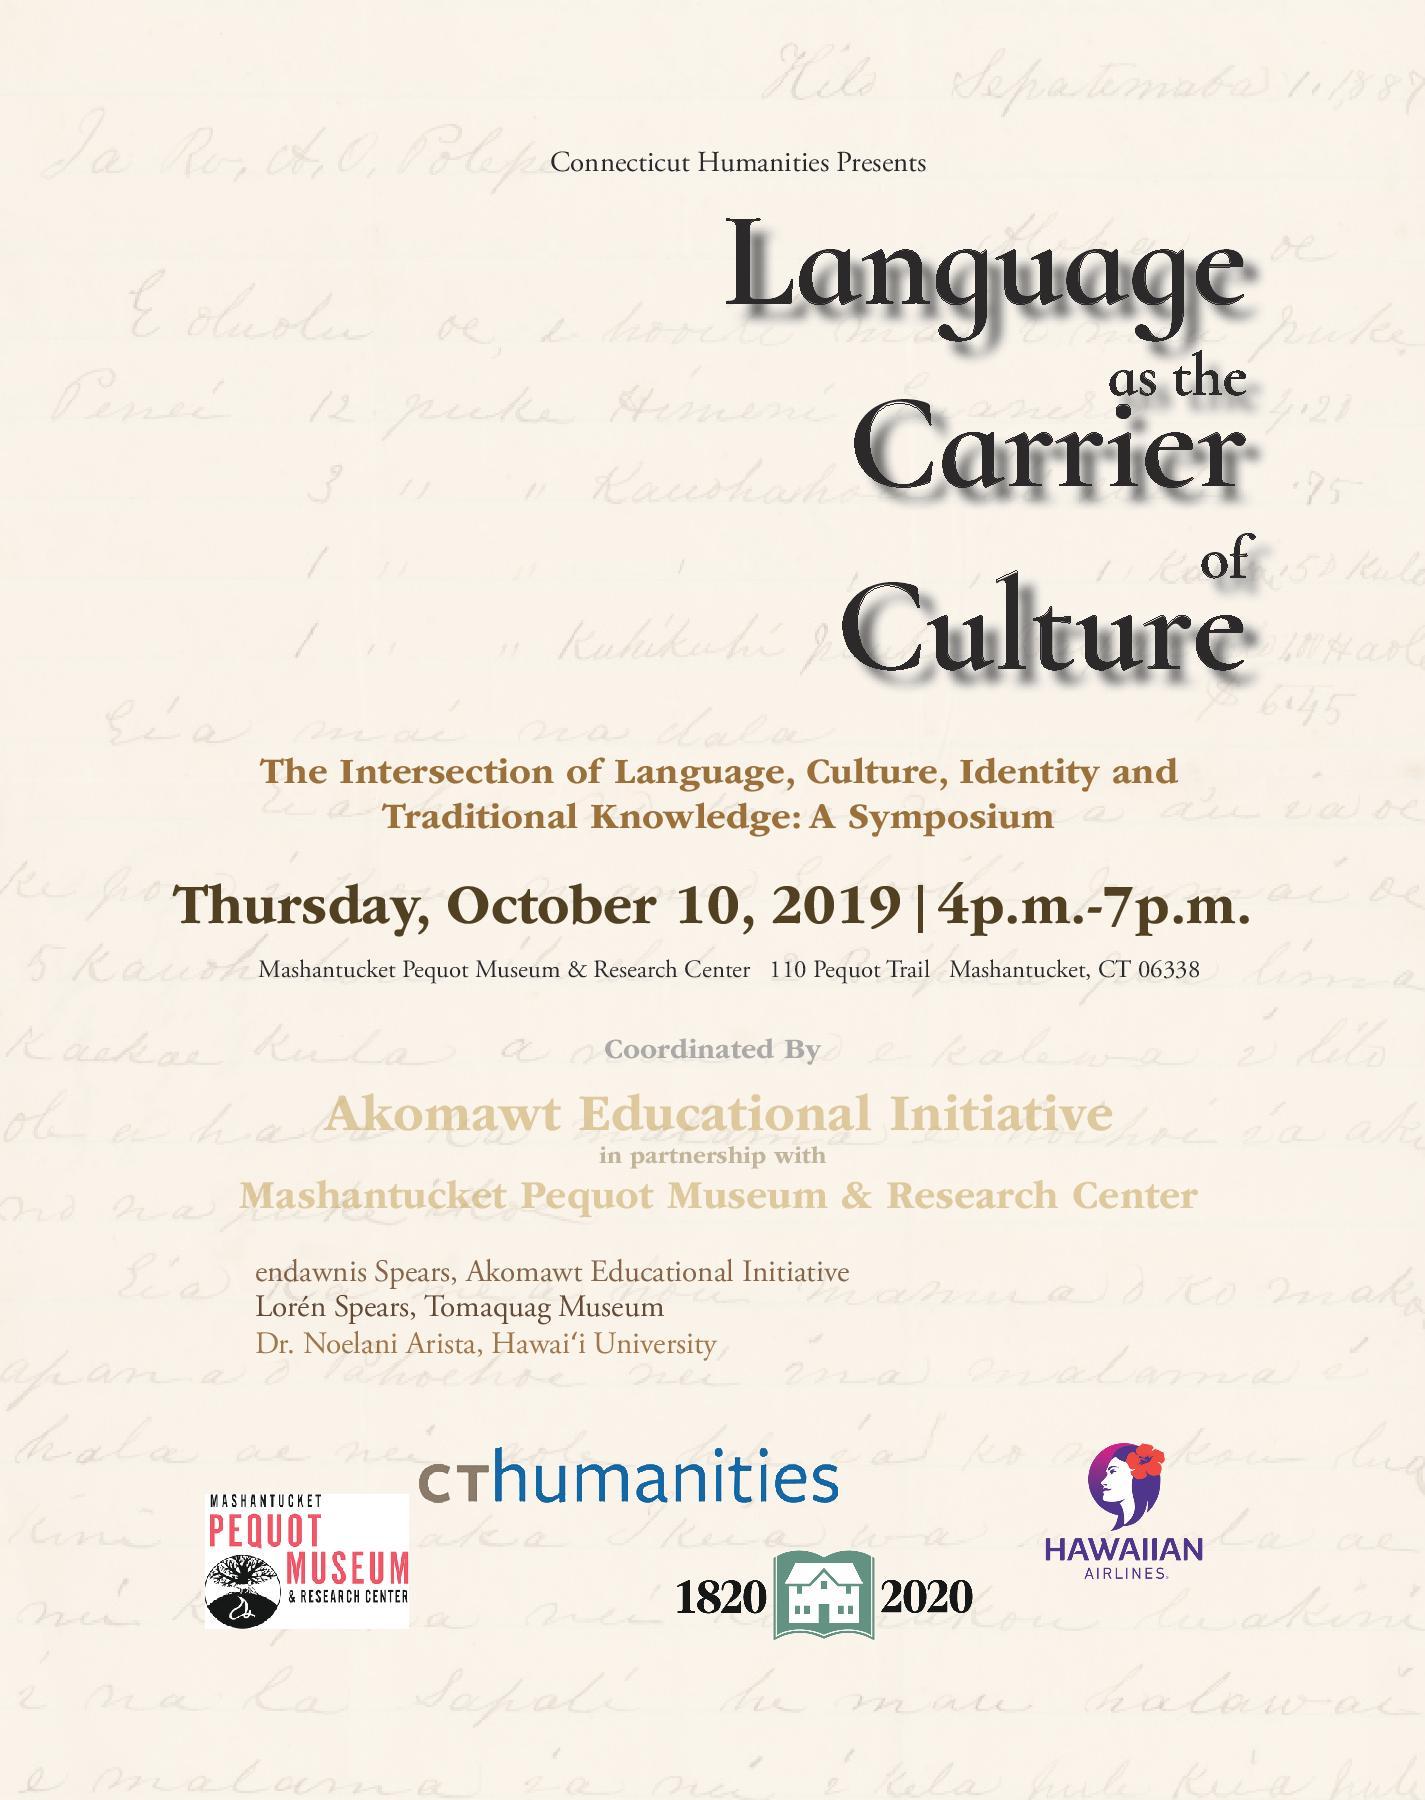 CT Humanities Symposium Promotion